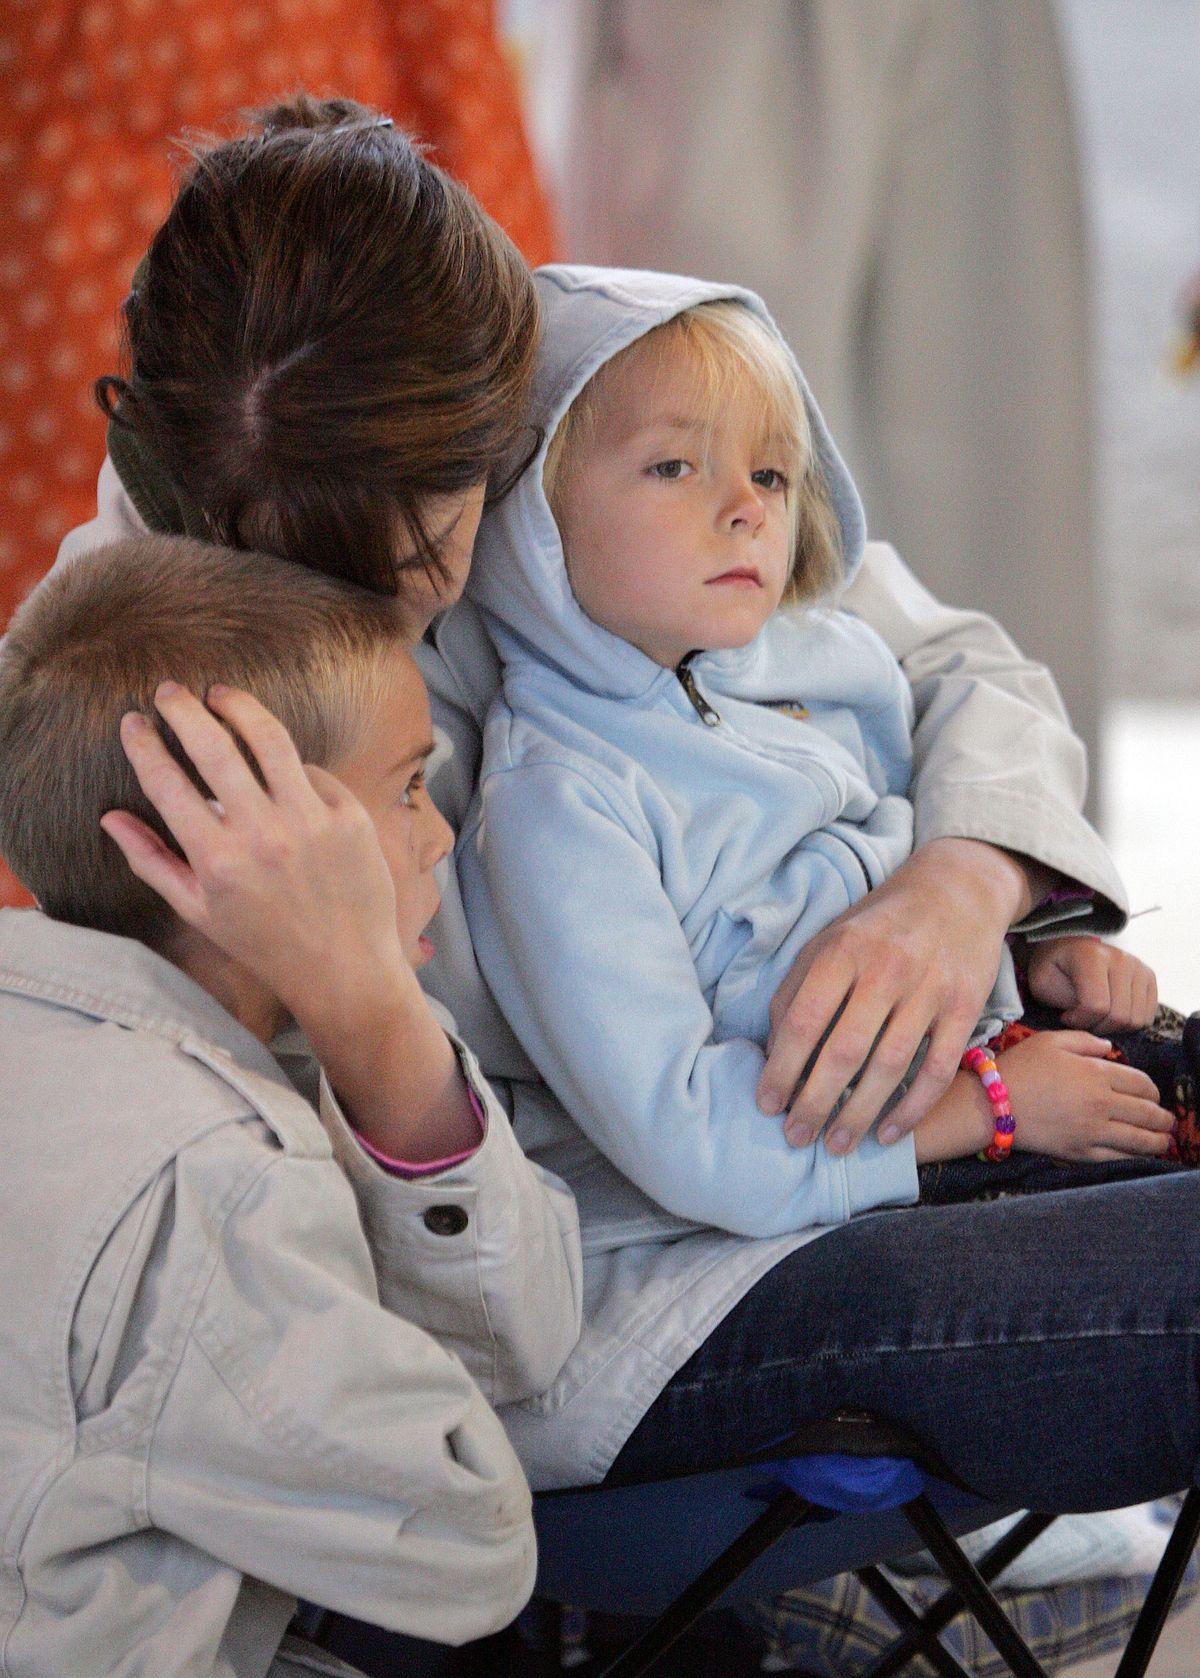 Camille Mortensen holds her children during a 9/11 service in 2005.